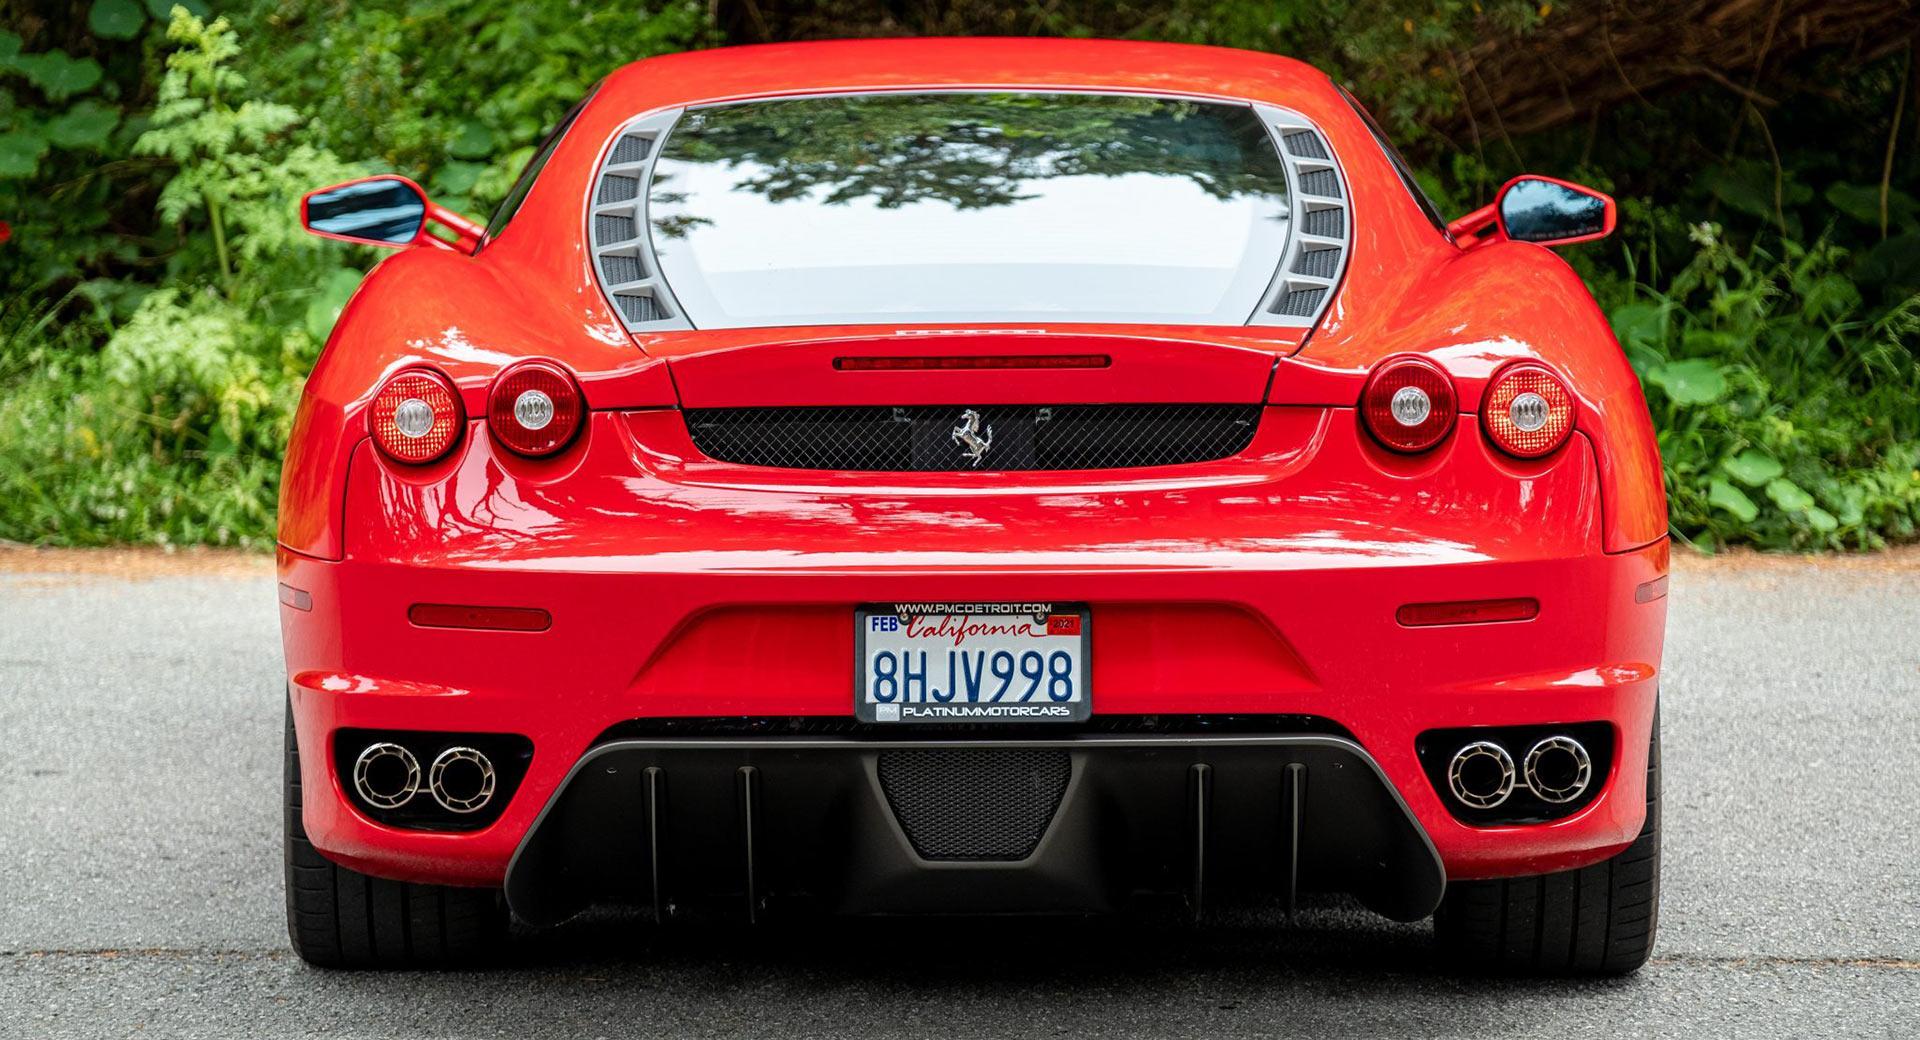 Ferrari F430 With Six Speed Manual Is A True Petrolhead S Supercar Carscoops